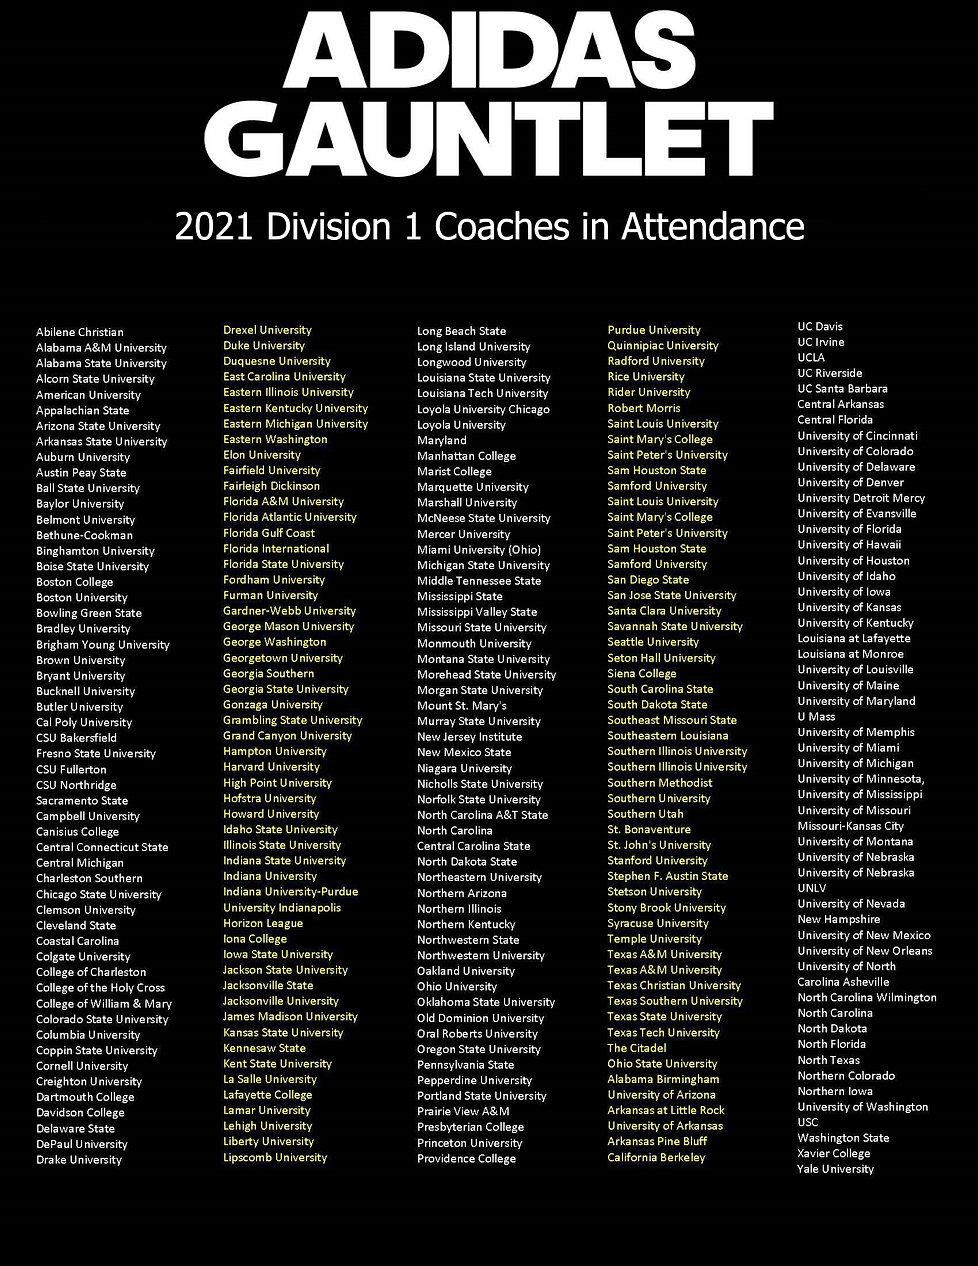 Adidas Gauntlet 2021.jpg